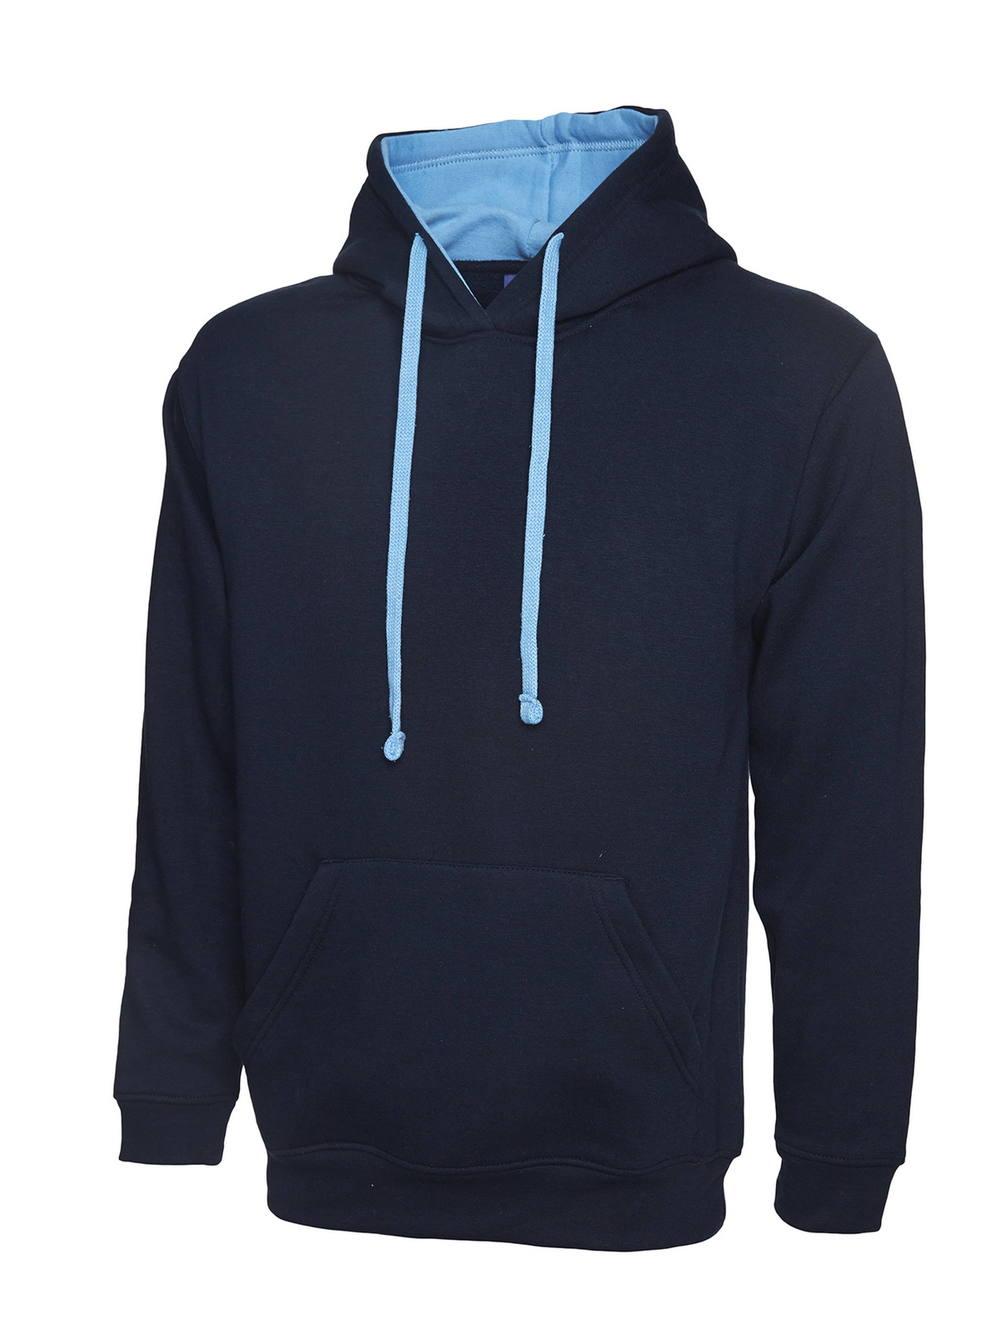 Uneek Contrast Hooded Sweatshirt